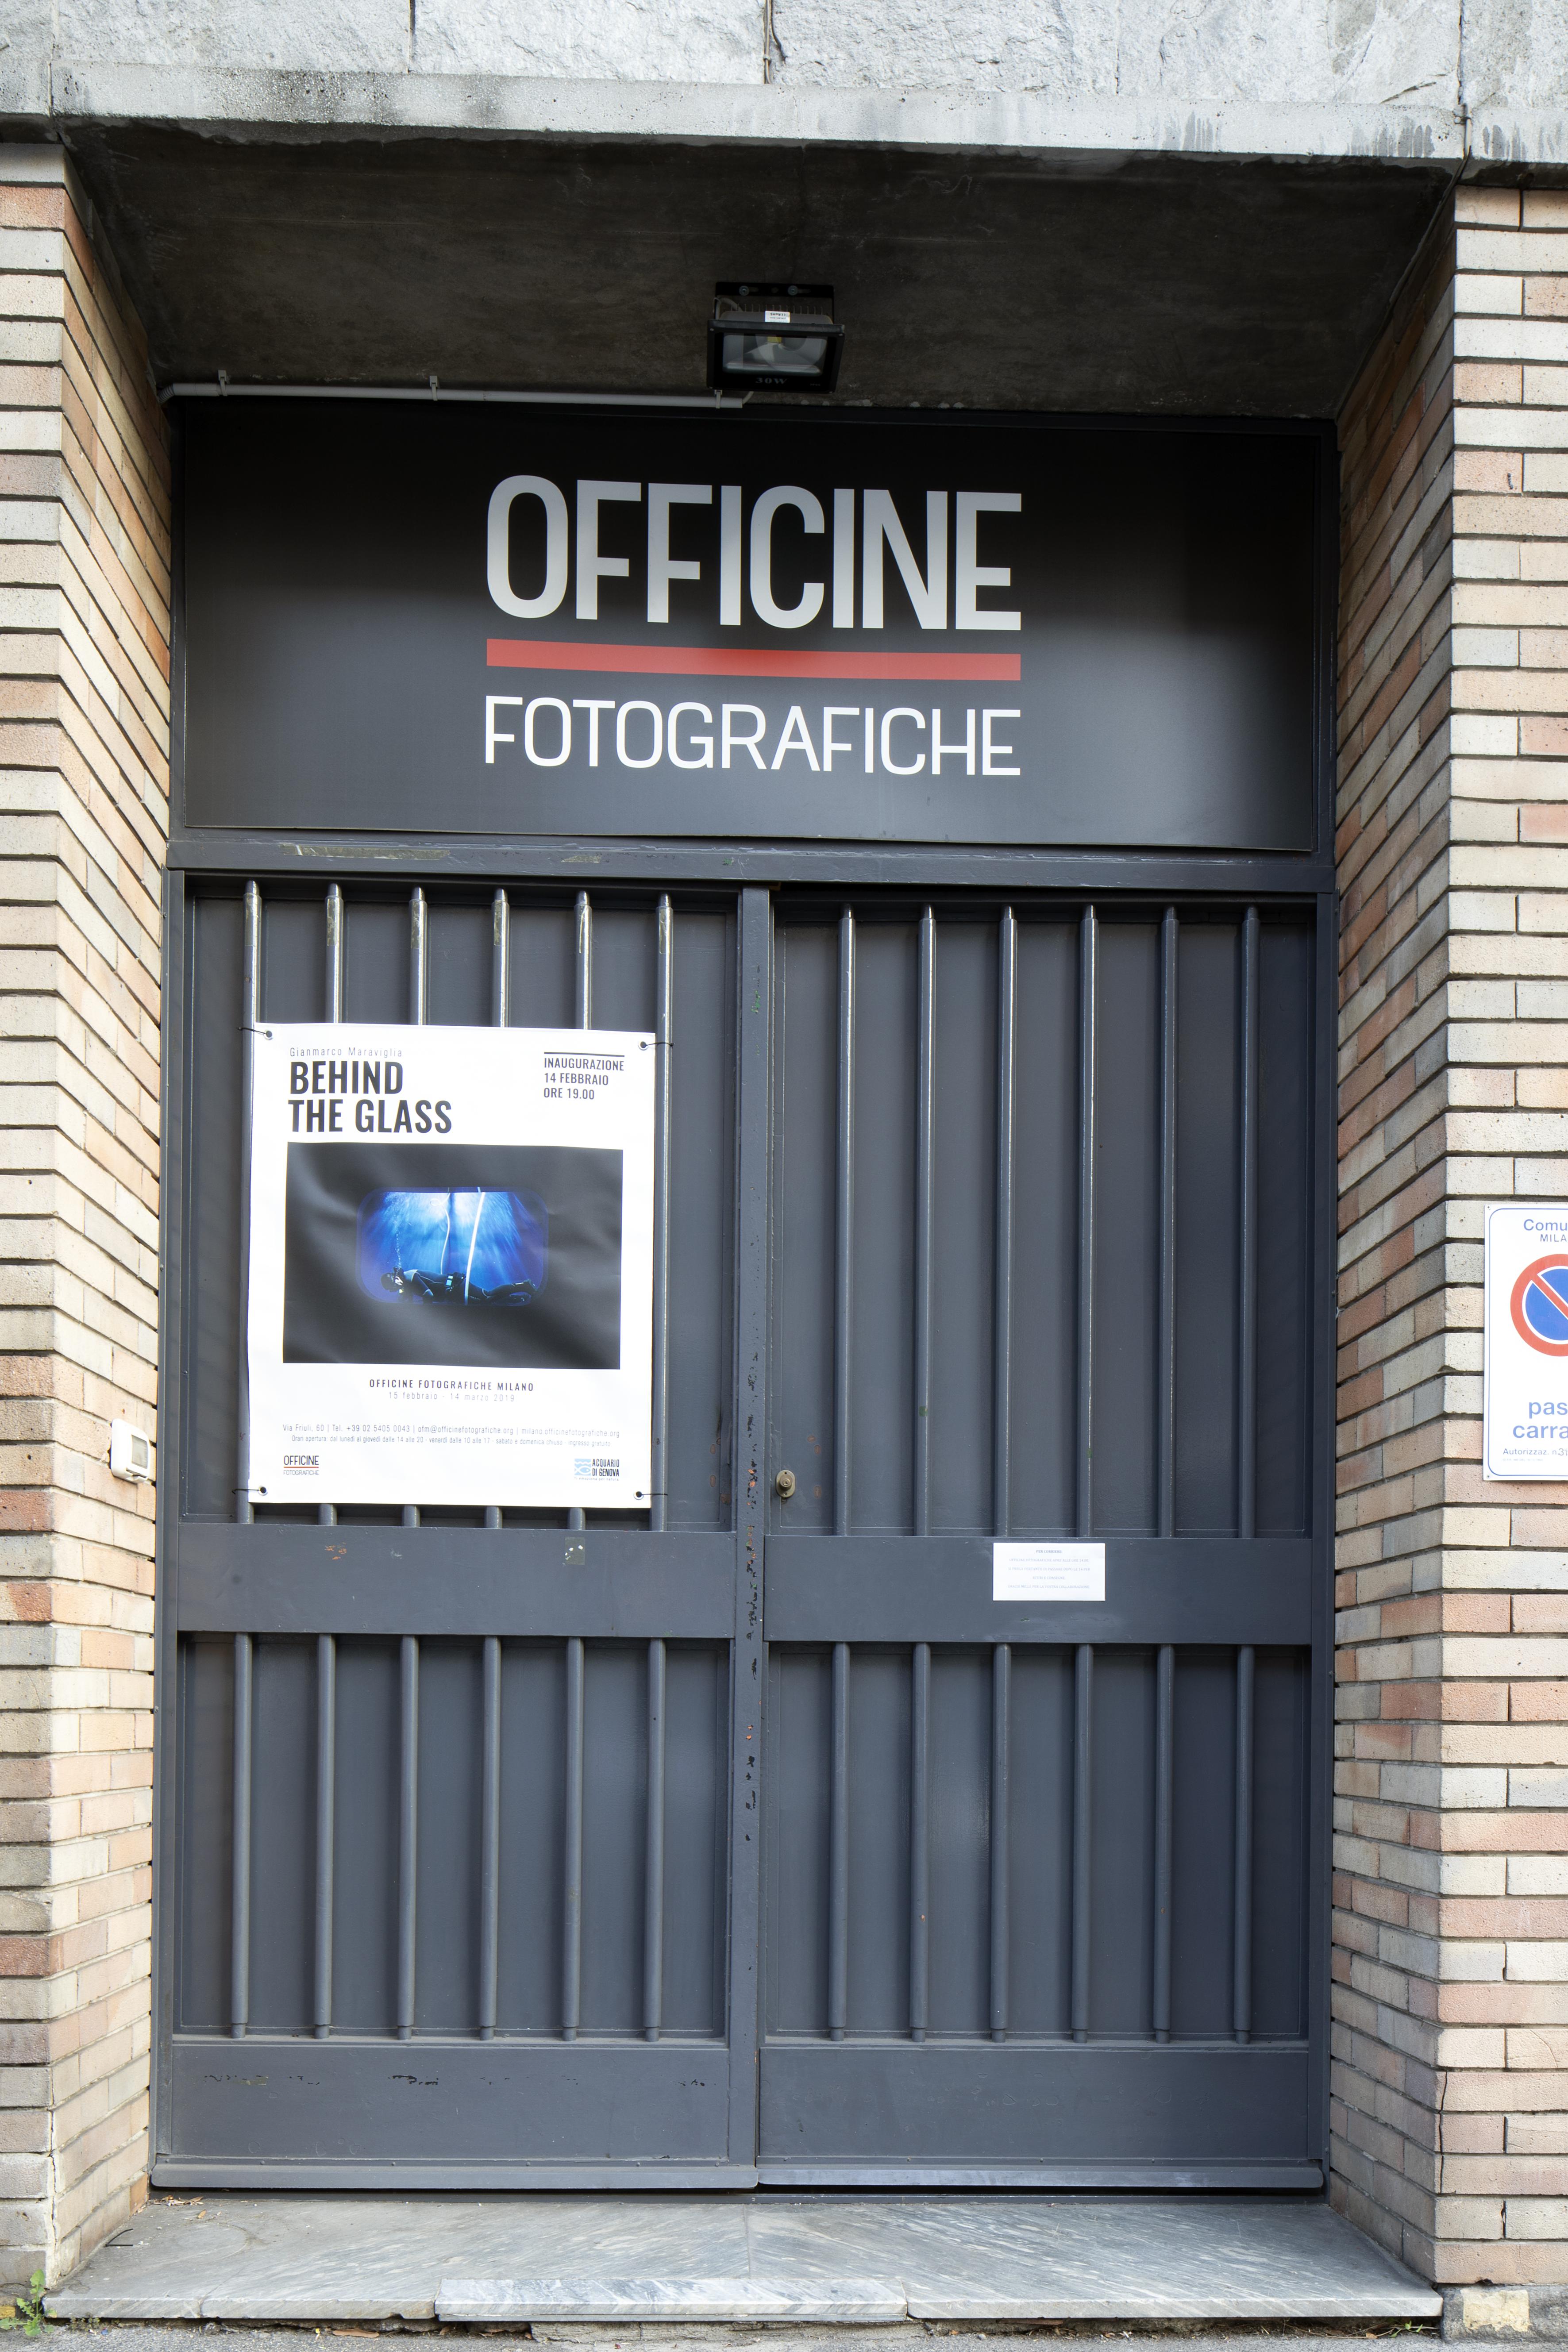 Via Friuli, 60